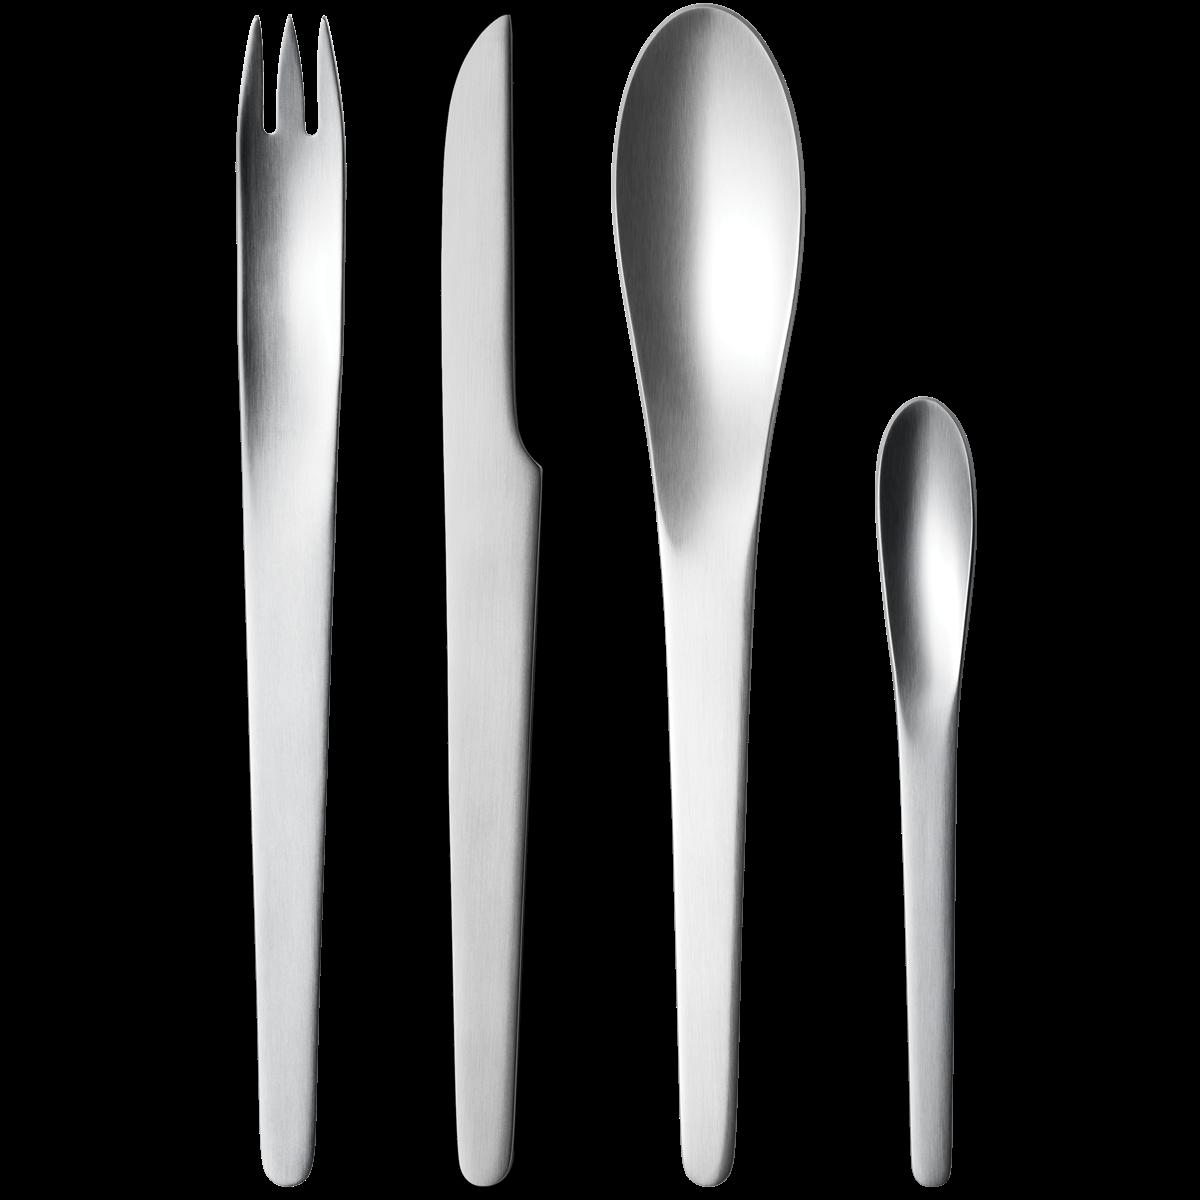 102 Plastic Silver Fork-Spoon-Knives-Serving Tools Cutlery Look of Silverware